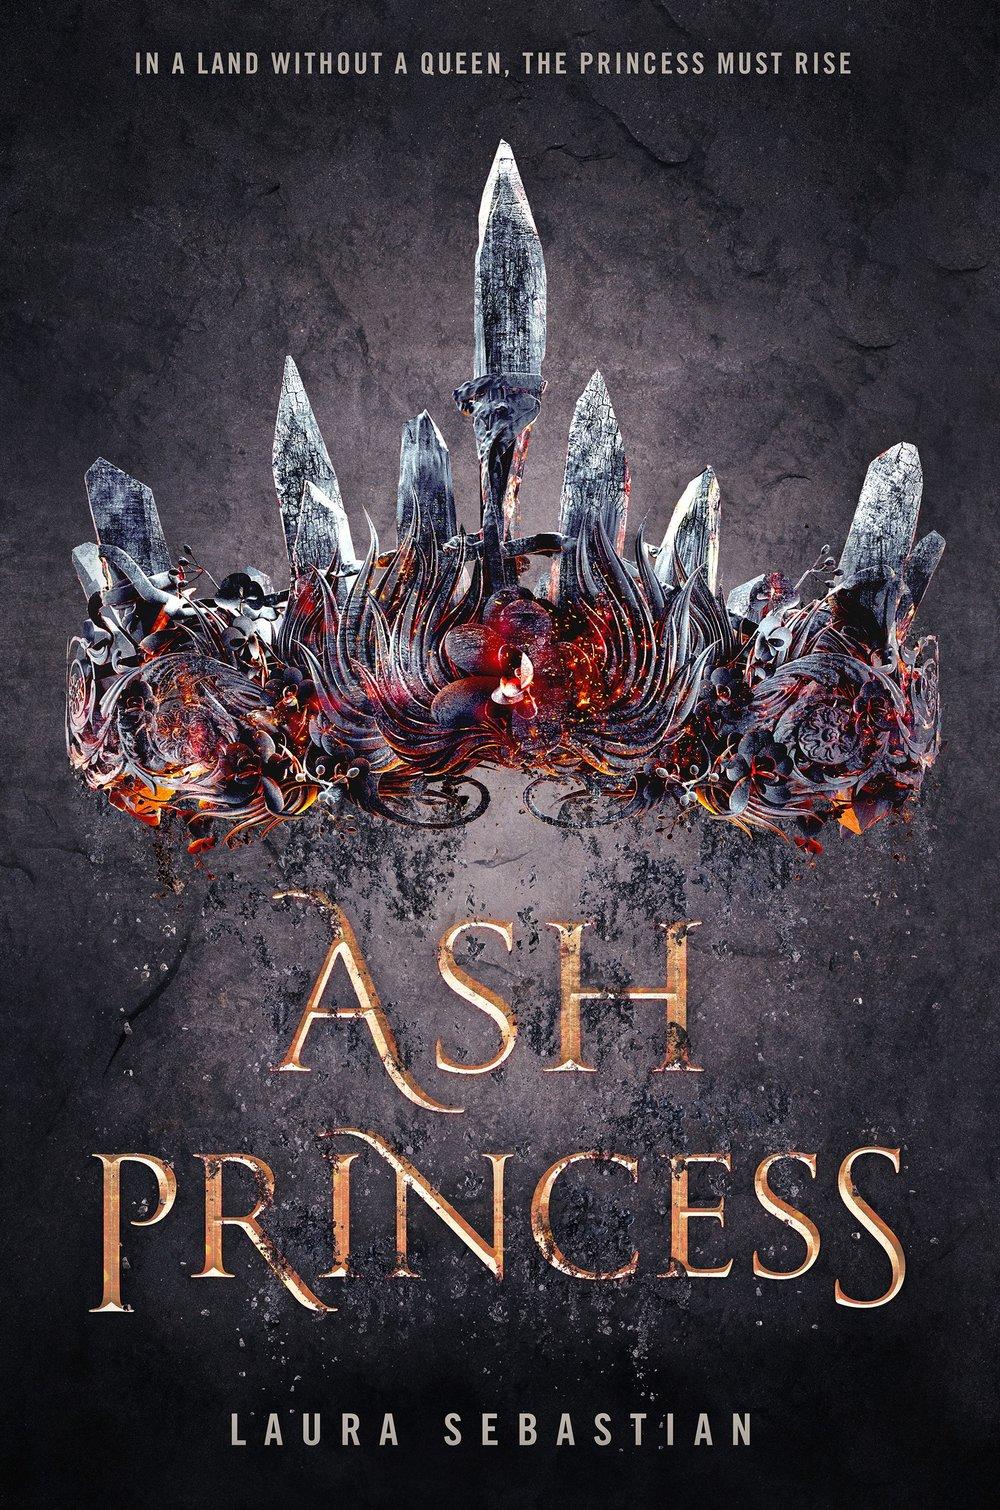 Ash Princess hi-res final cover.jpg